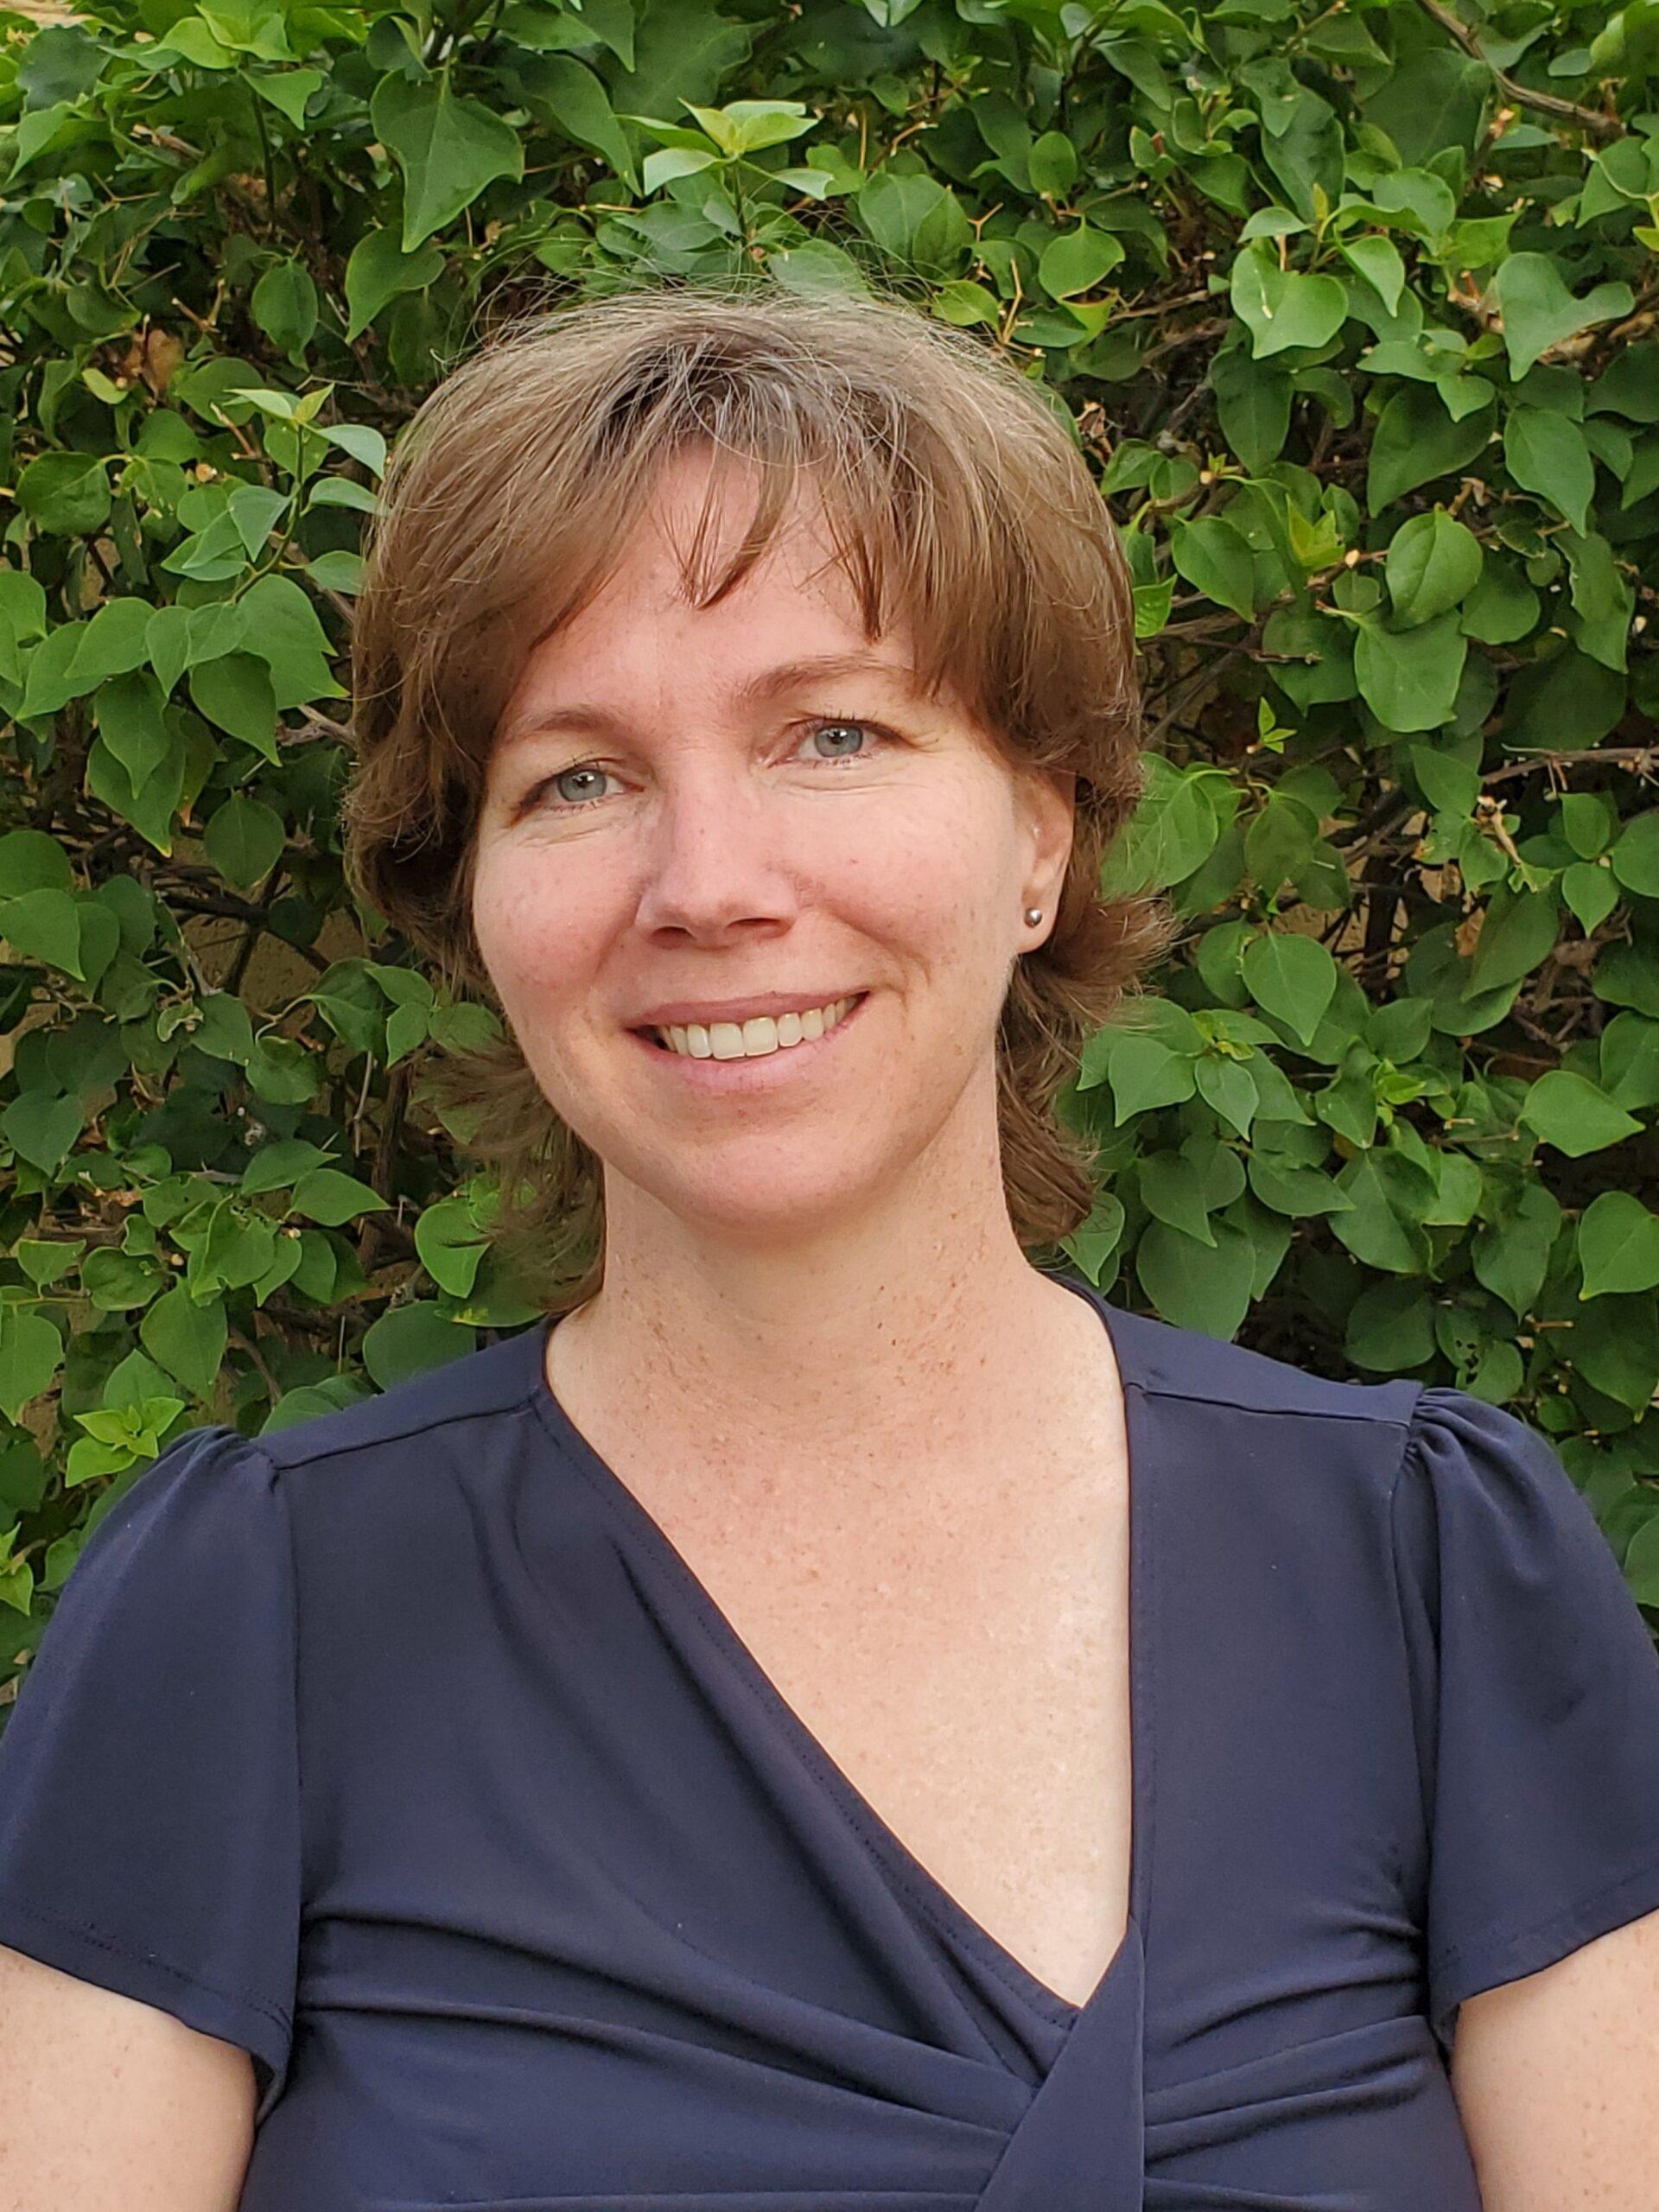 Jessica Graybill